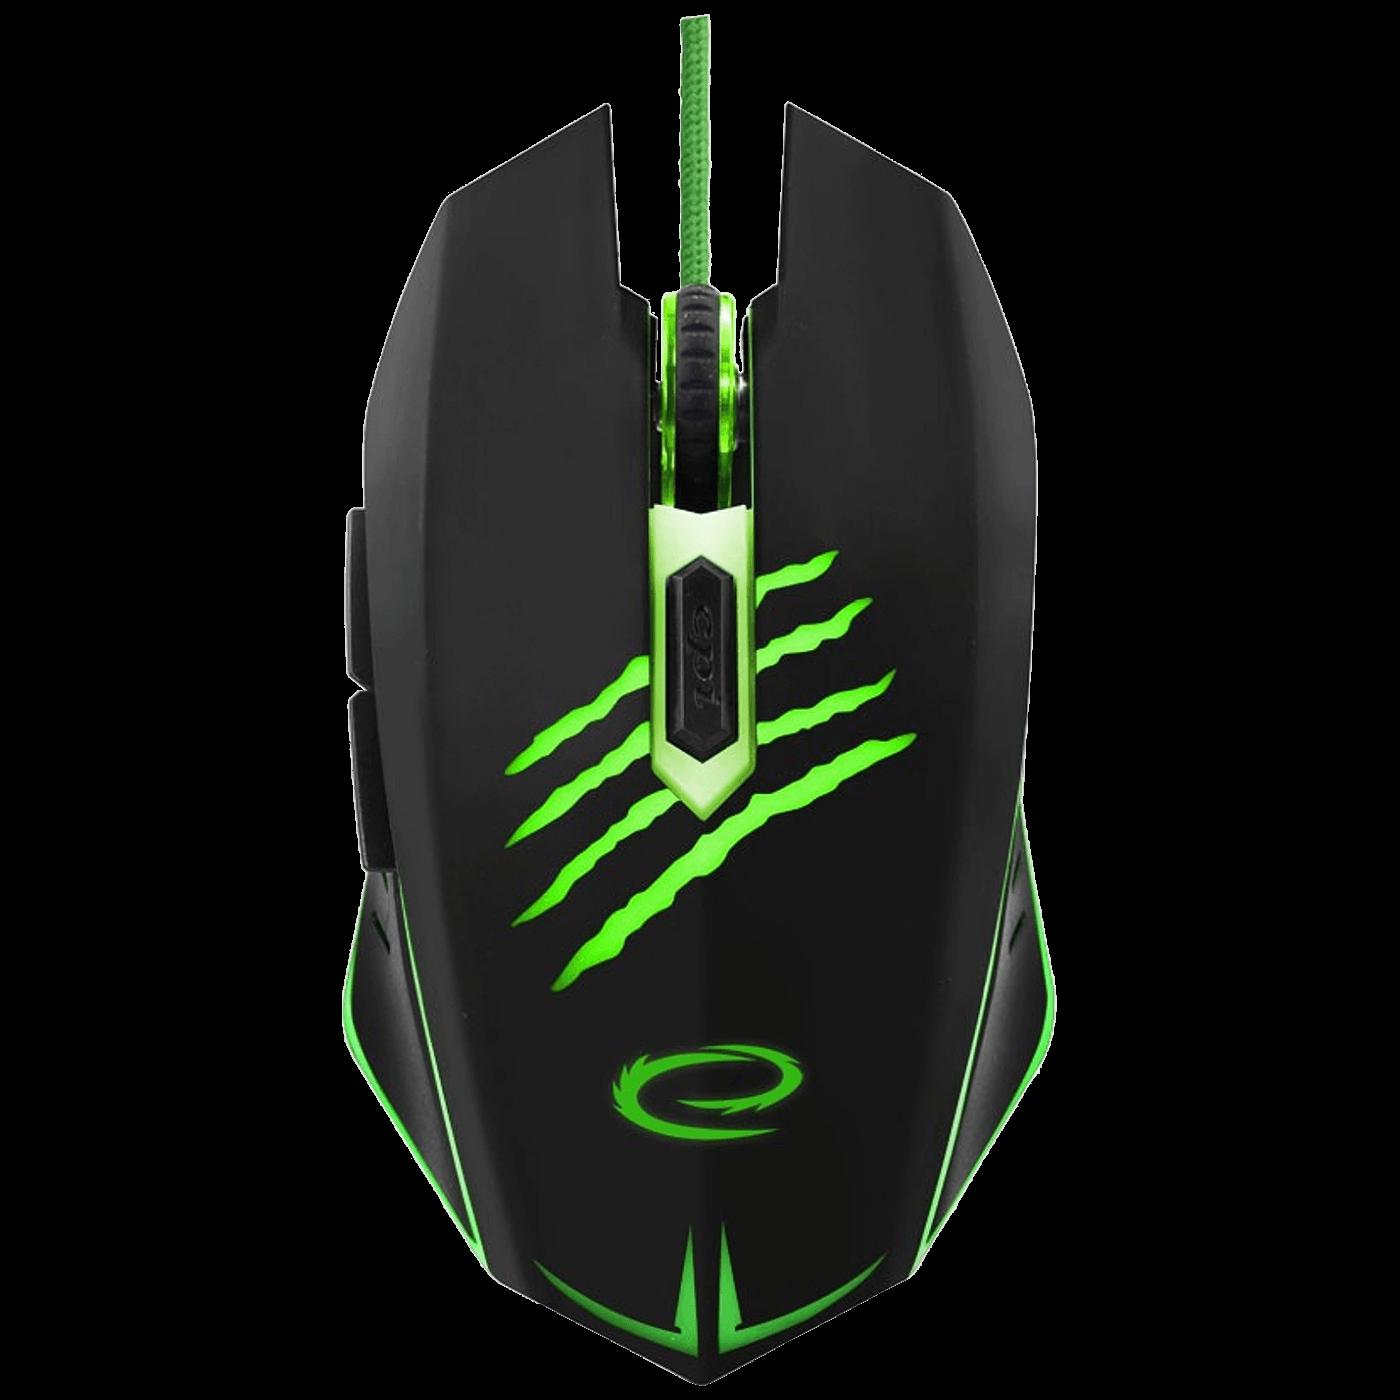 Miš optički, gaming, 2400 dpi, USB